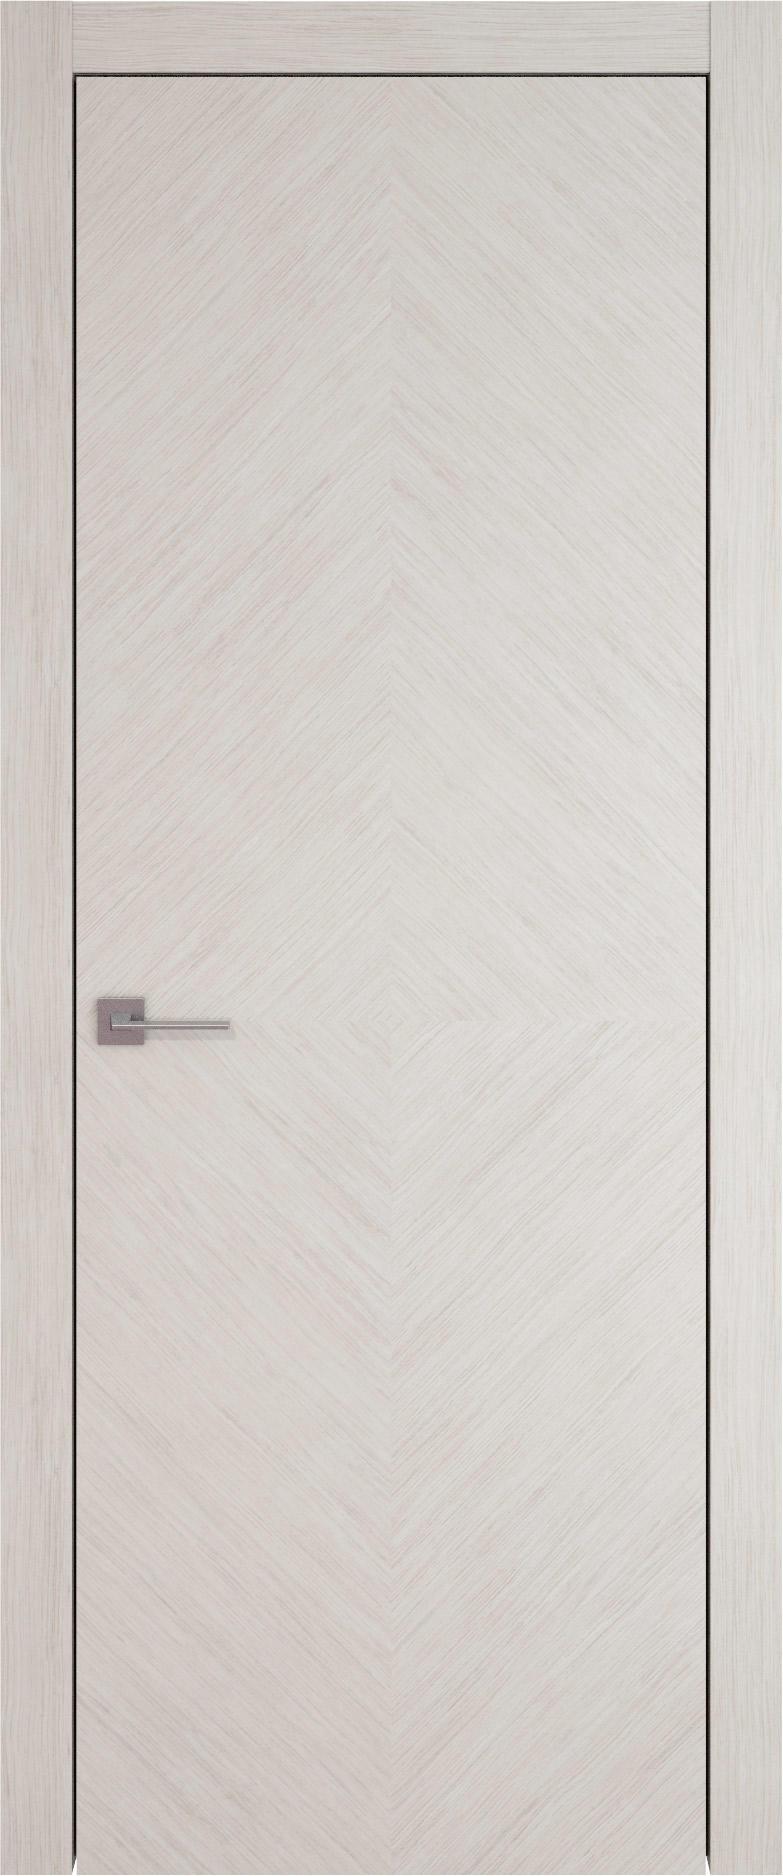 Tivoli К-1 цвет - Дымчатый дуб Без стекла (ДГ)